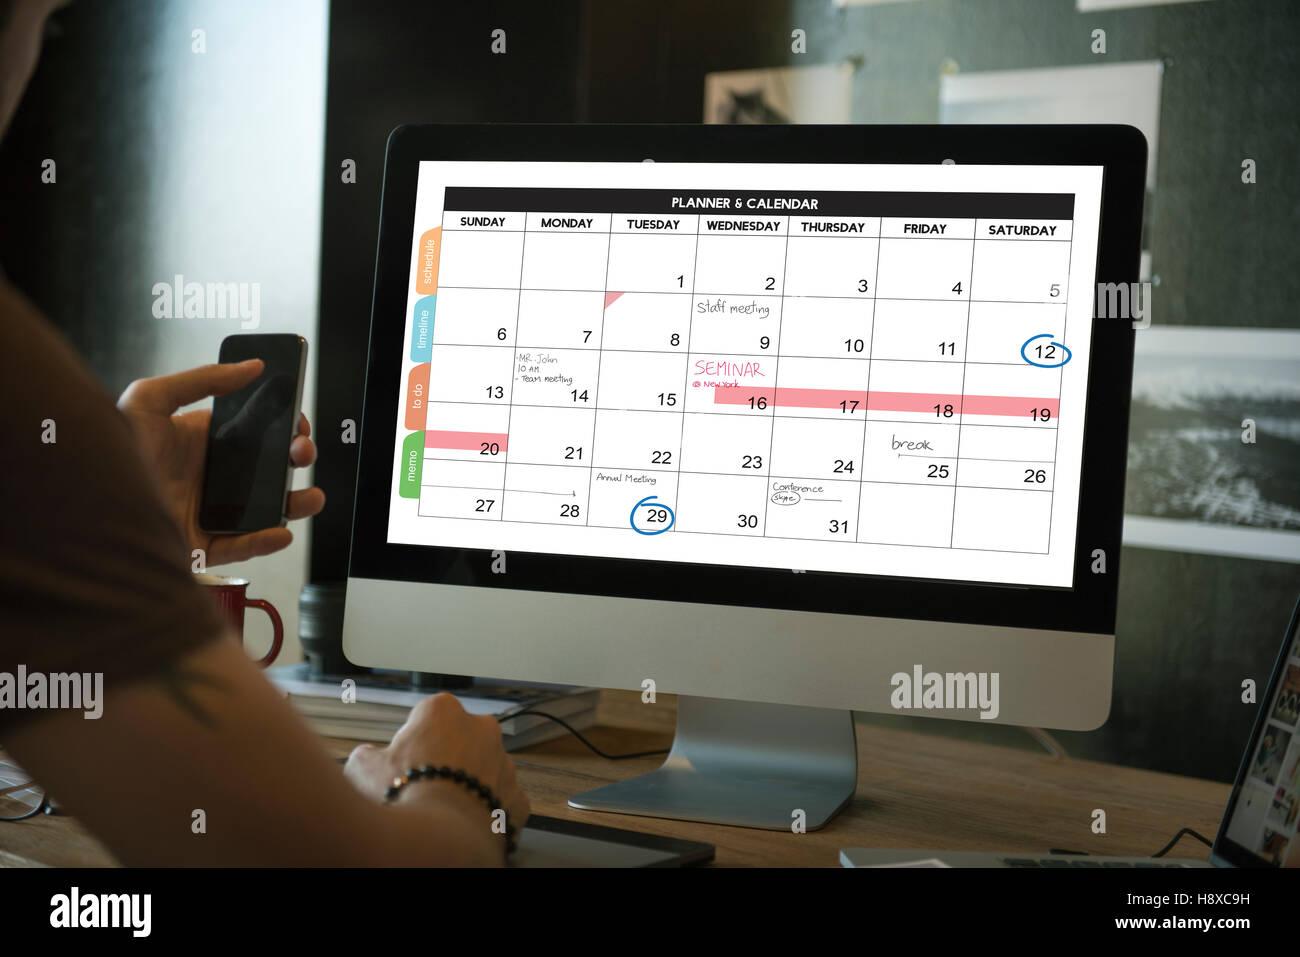 weekly planner schedule memo timeline concept stock photo 125970253